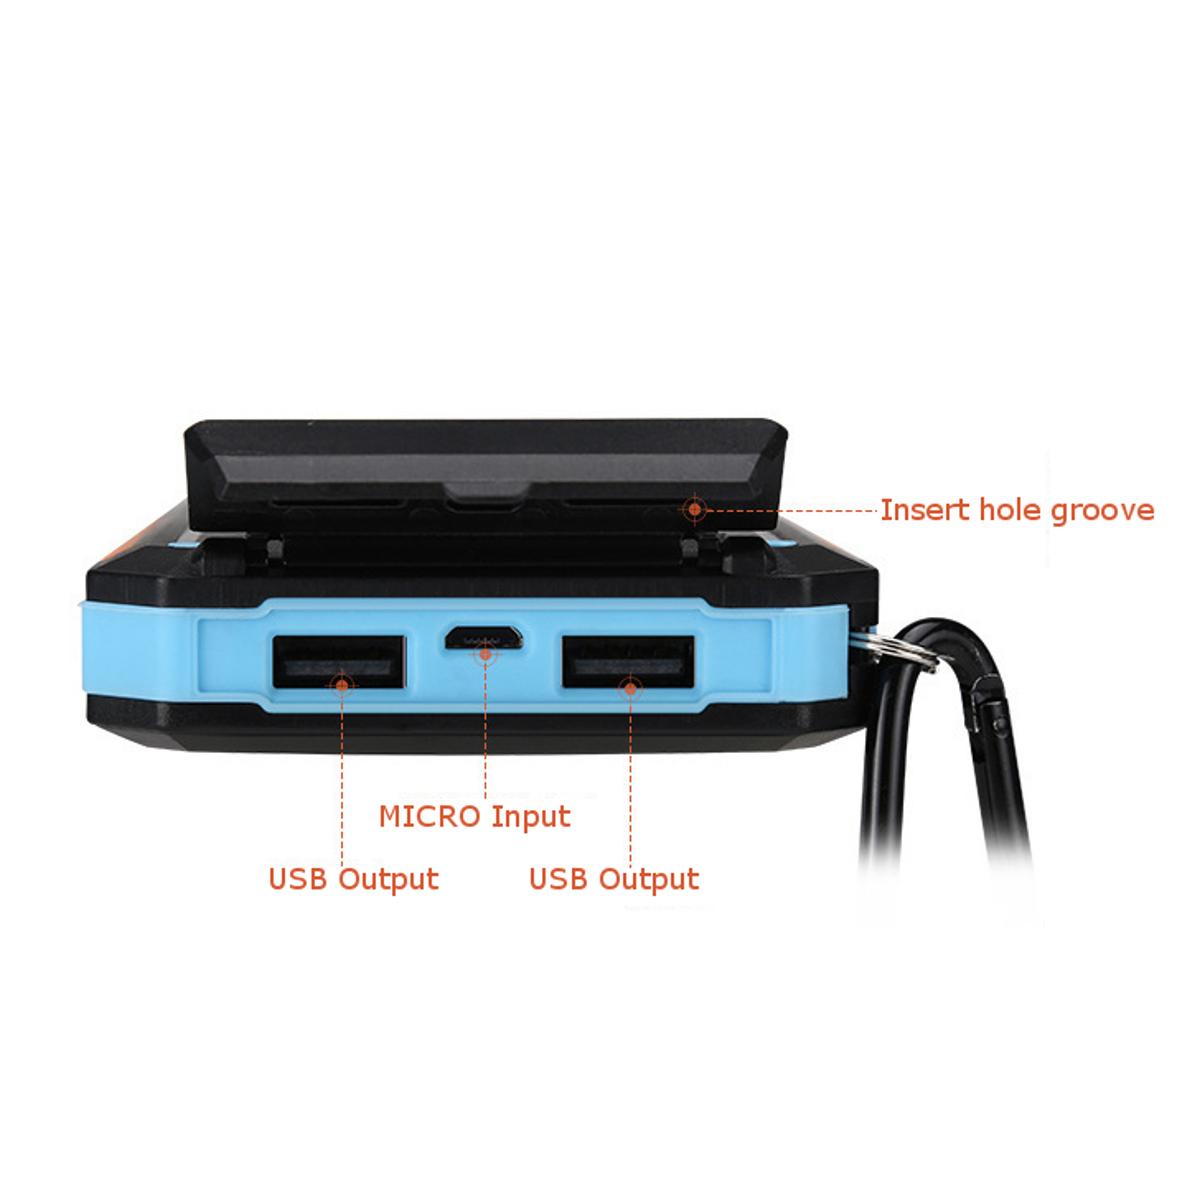 Bakeey LED Flashight 10000mAh Dual USB Солнечная Energy DIY Банк питания Батарея Чехол Для планшета мобильного телефона - фото 6